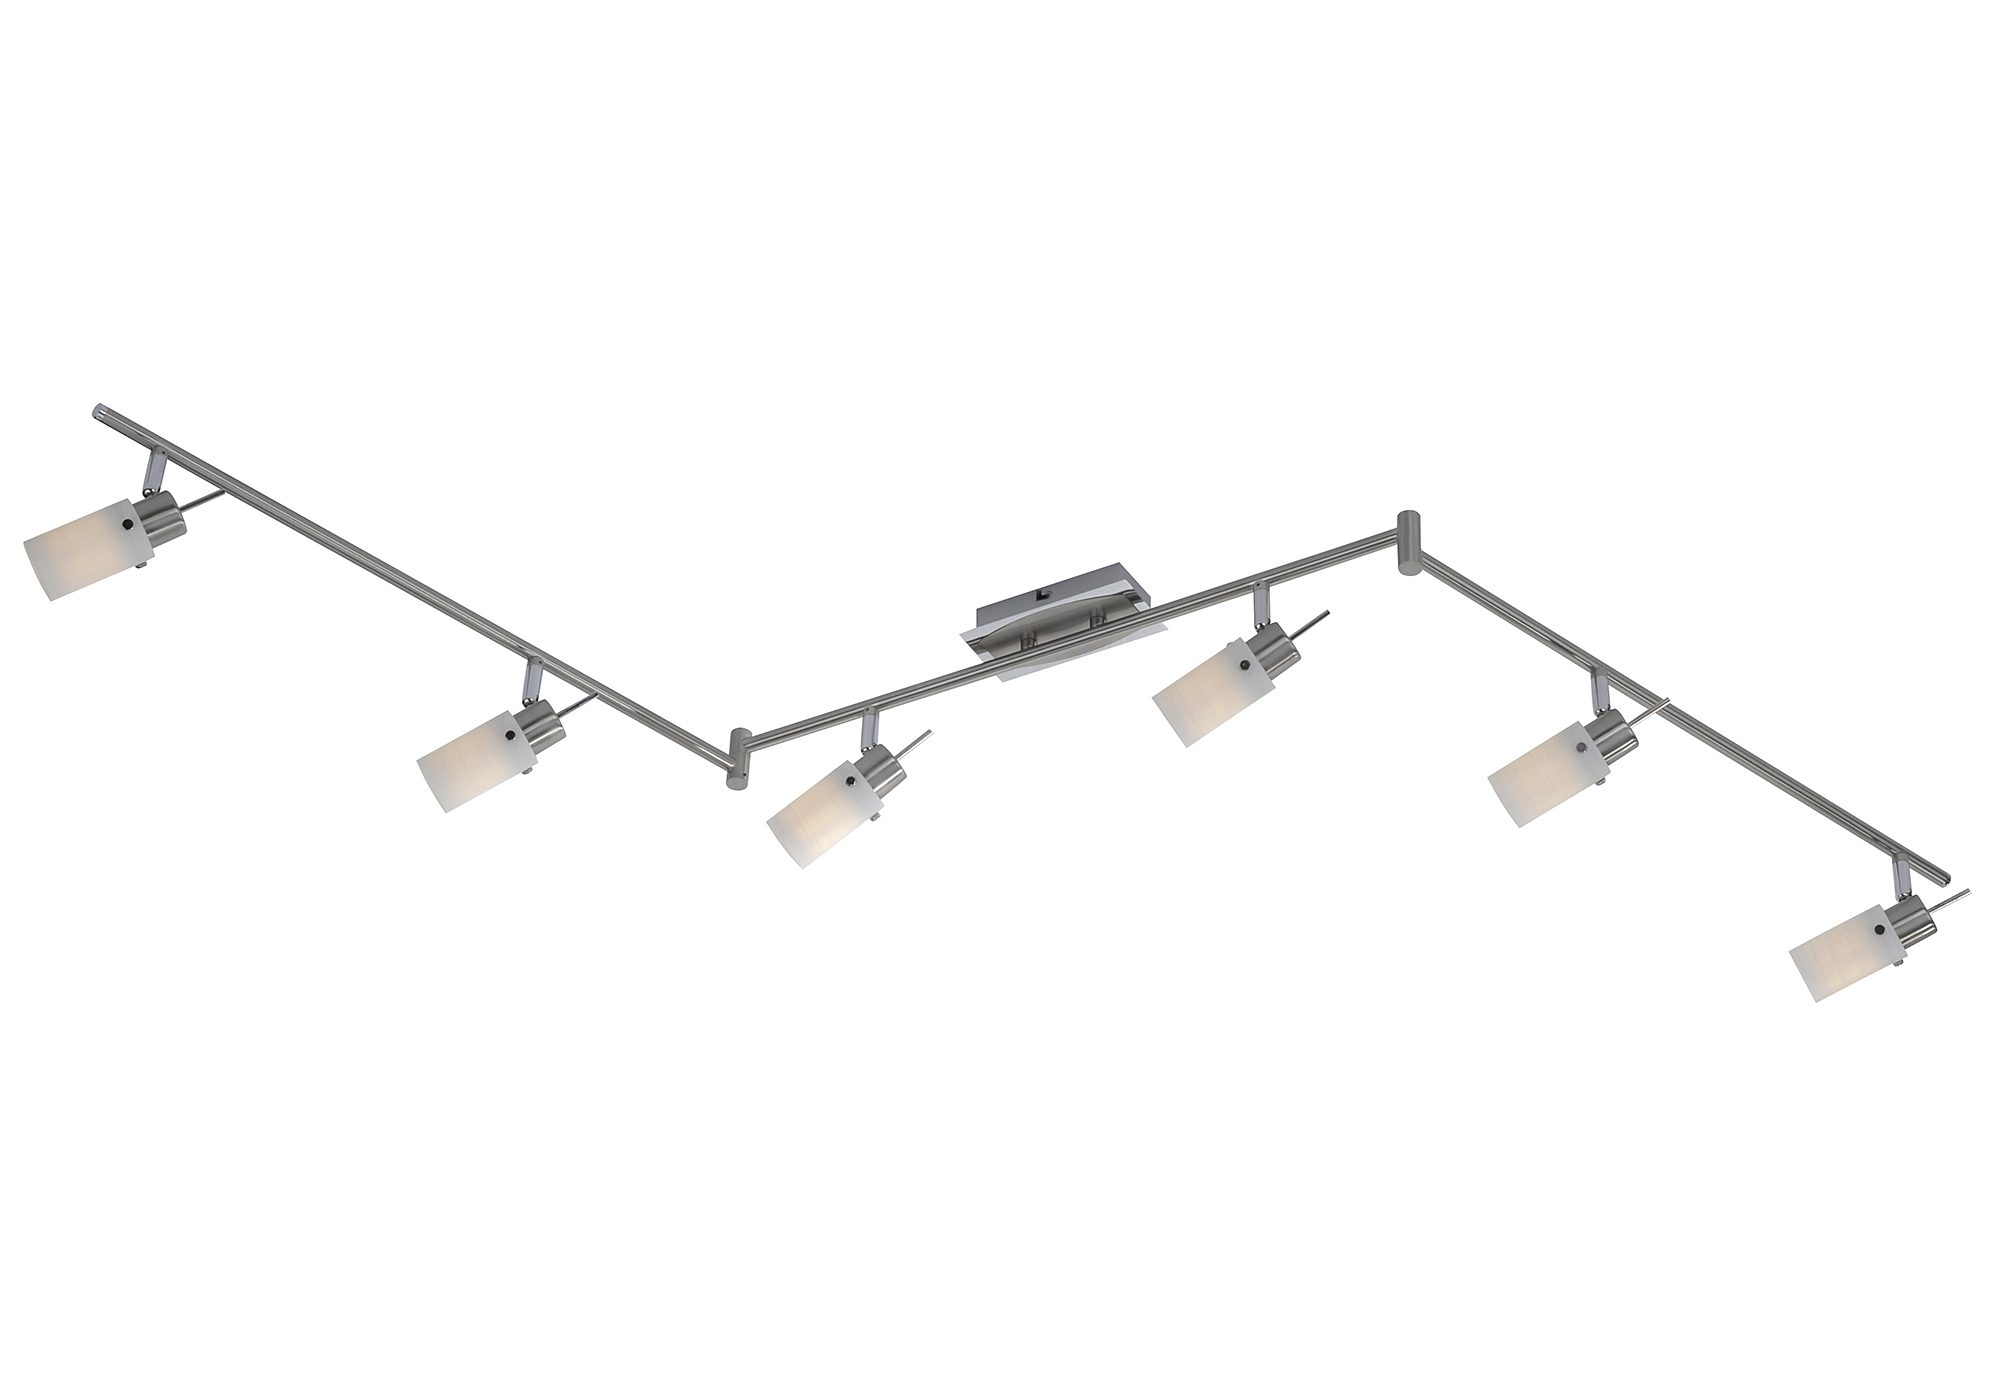 Paul Neuhaus LED Deckenstrahler, 6-flammig